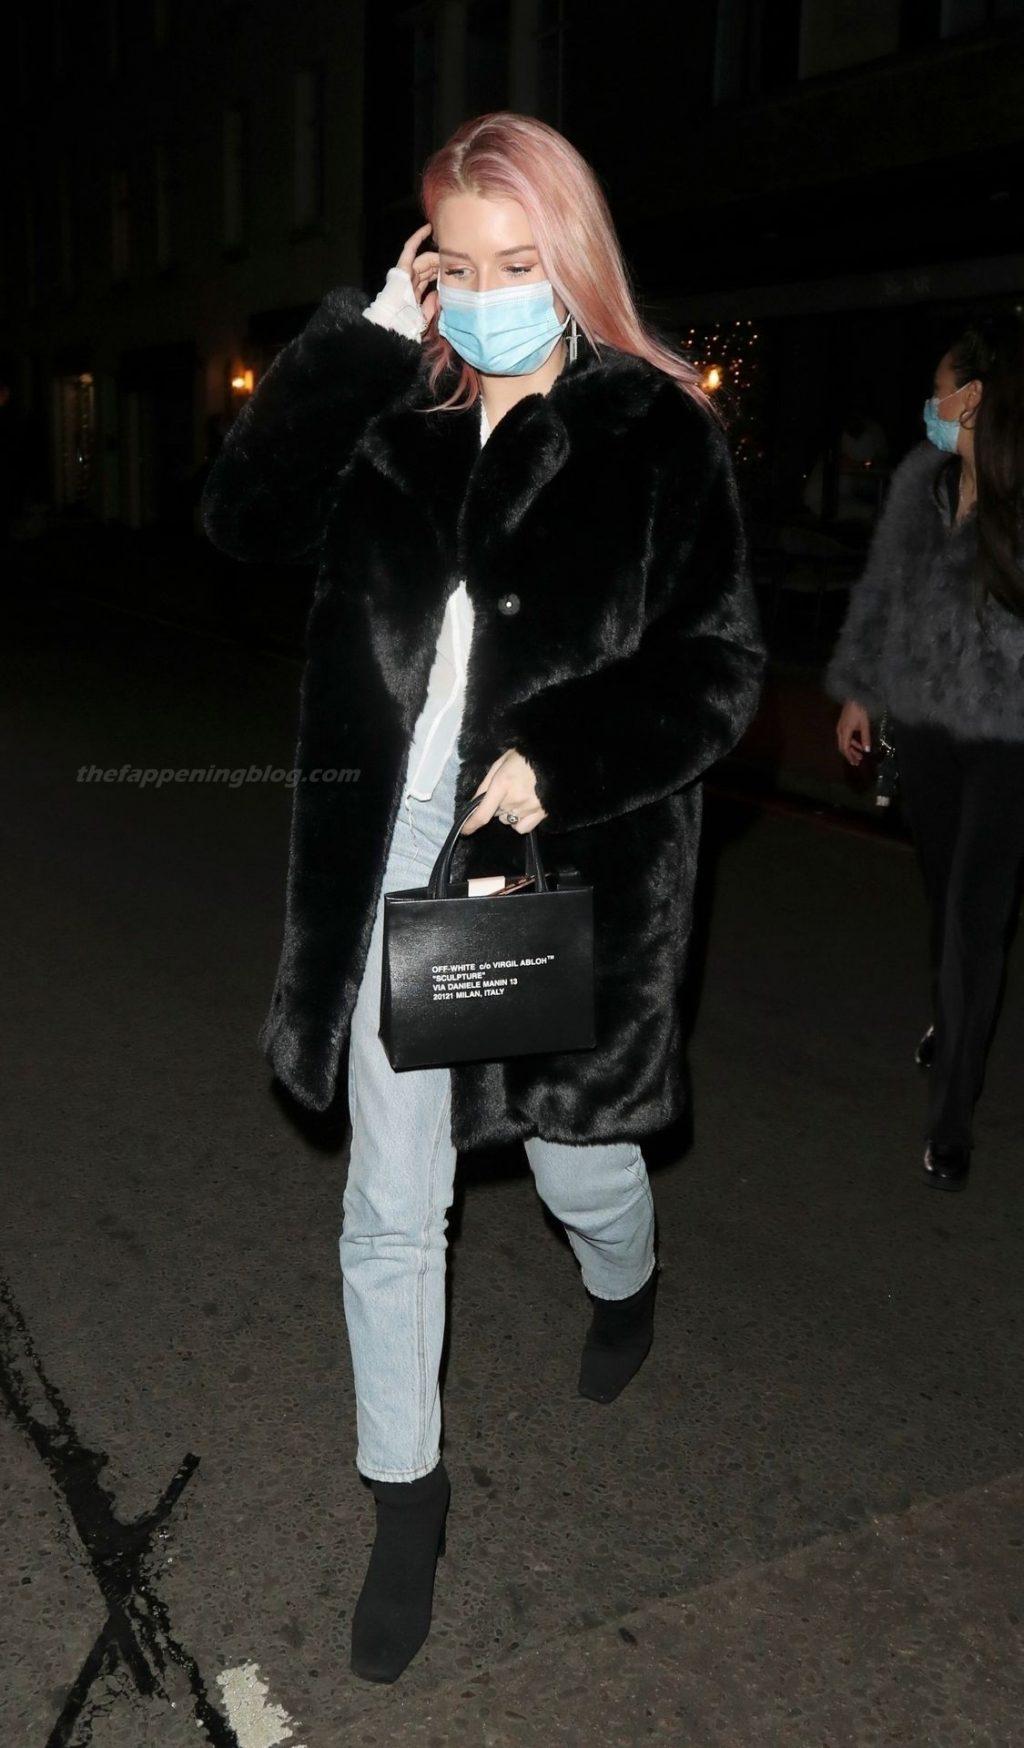 Lottie Moss is Seen Braless at Xier Restaurant in London (33 Photos)